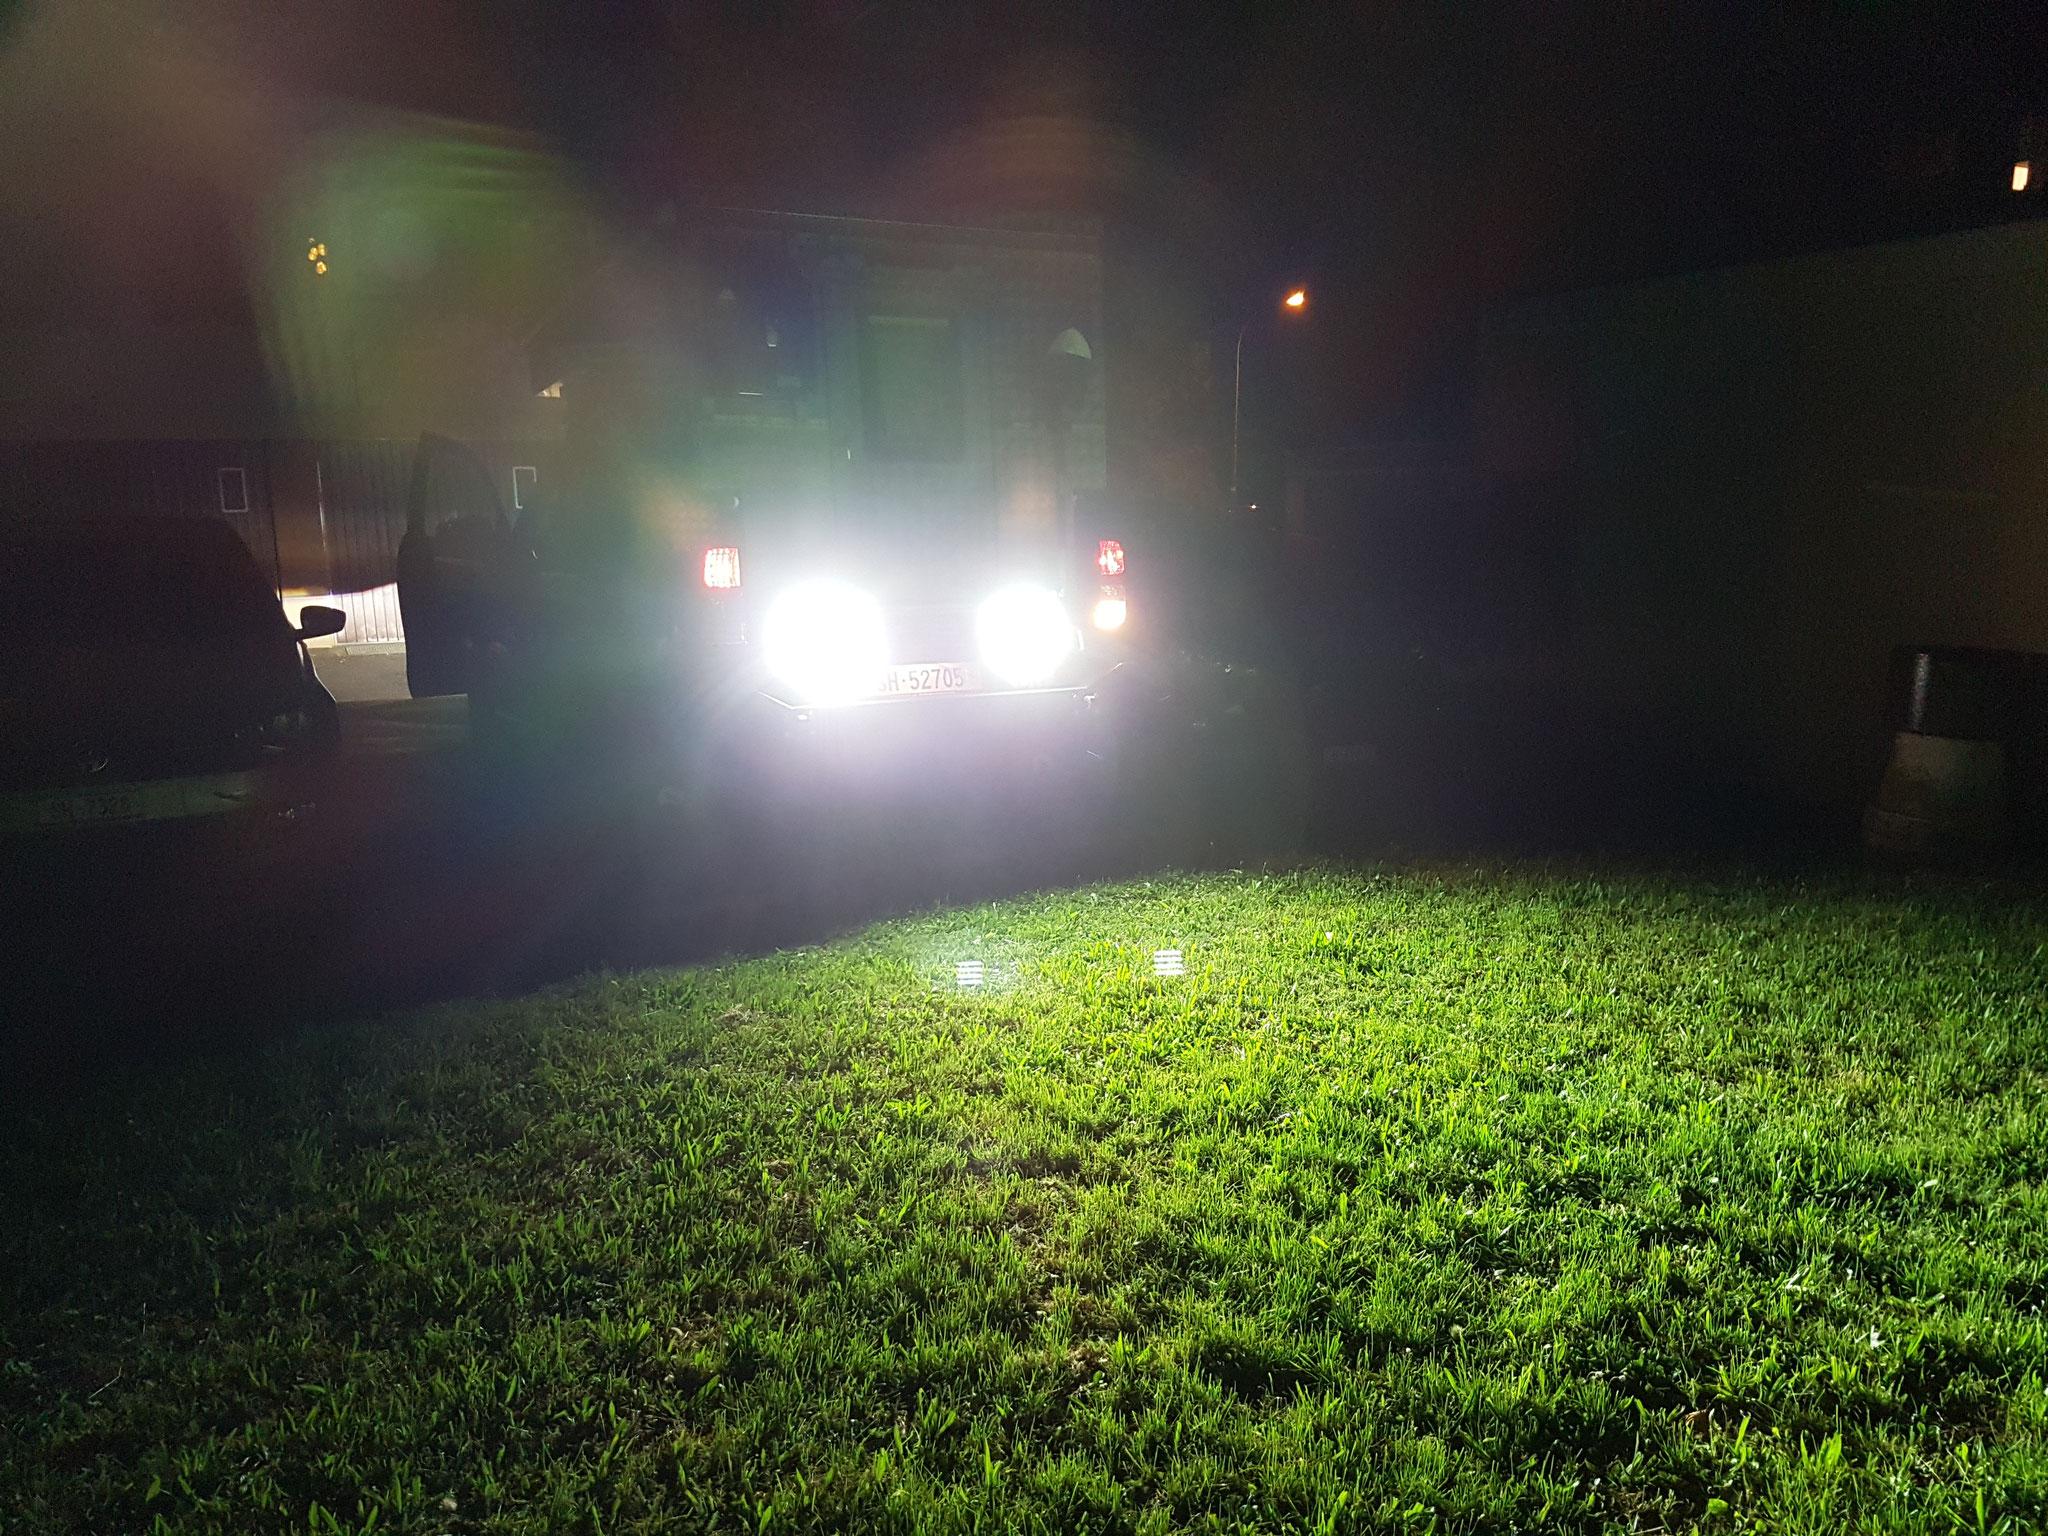 24W Lightpartz solutions Rückfahrscheinwerfer LED TÜV Strassen zugelassen LTPZ-RL004-F ECE R23 ECE R10 #Projektblackwolf